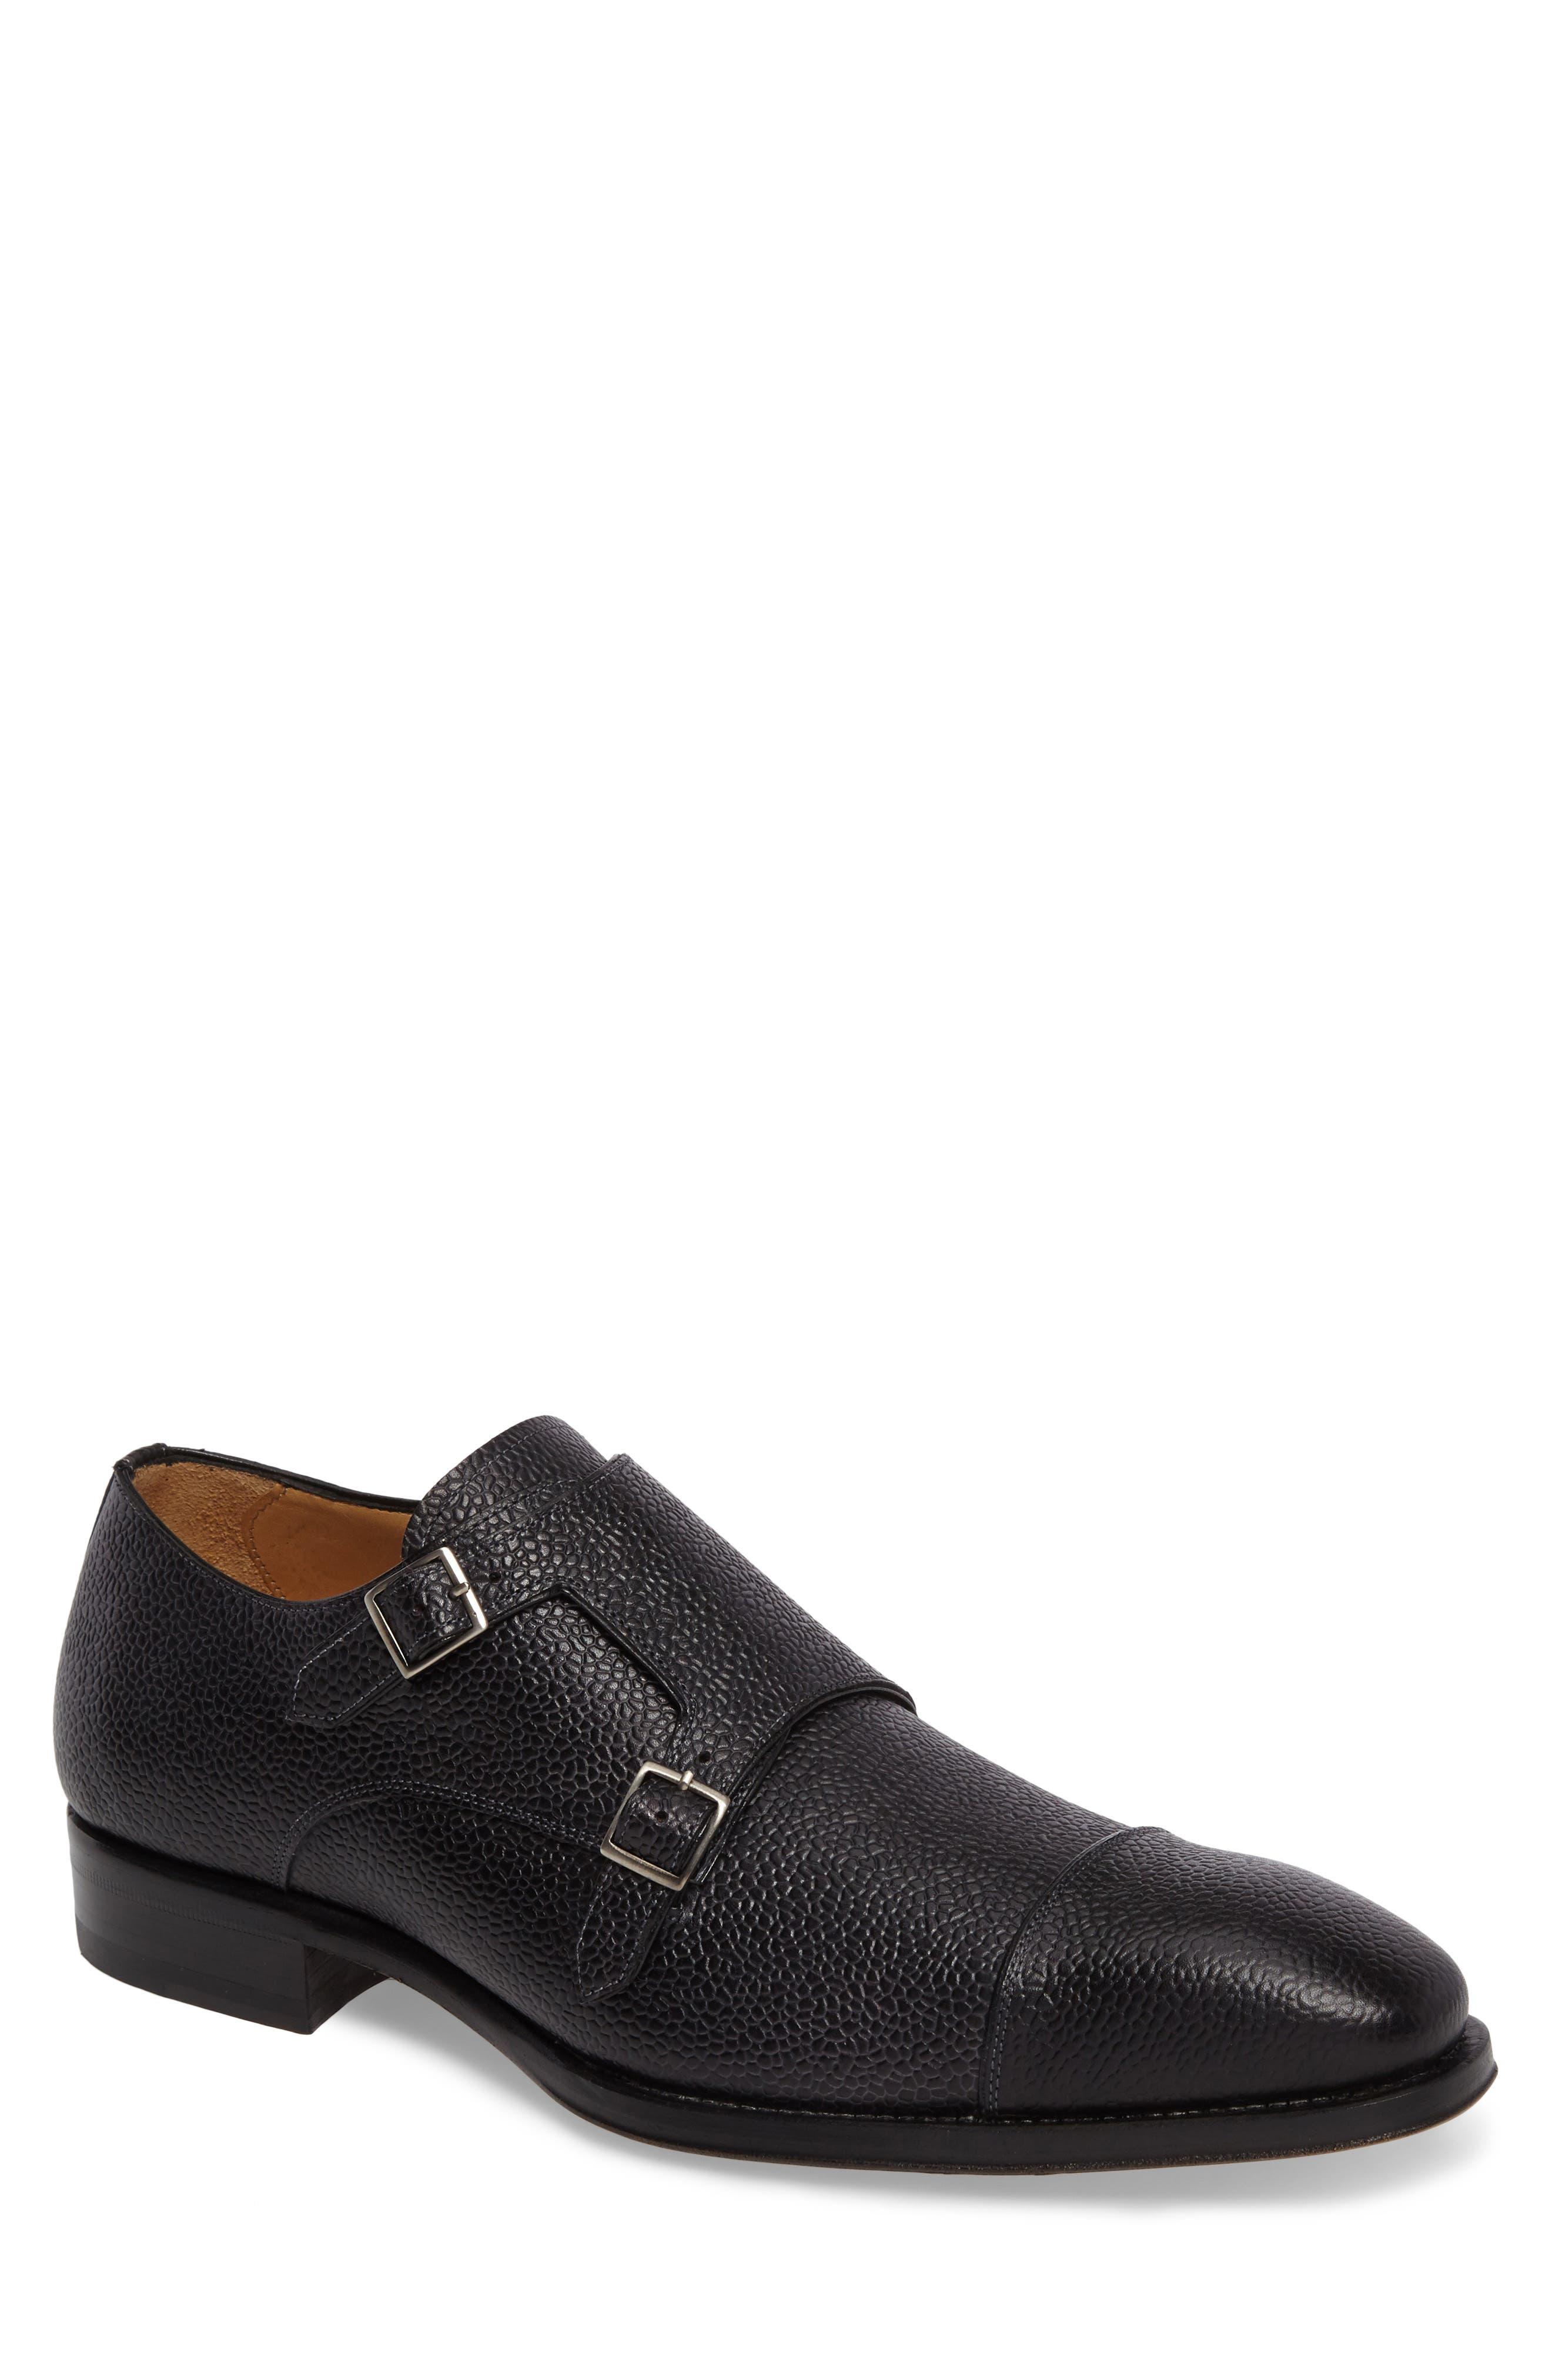 Lubrin Double Monk Strap Shoe,                         Main,                         color, BLACK LEATHER